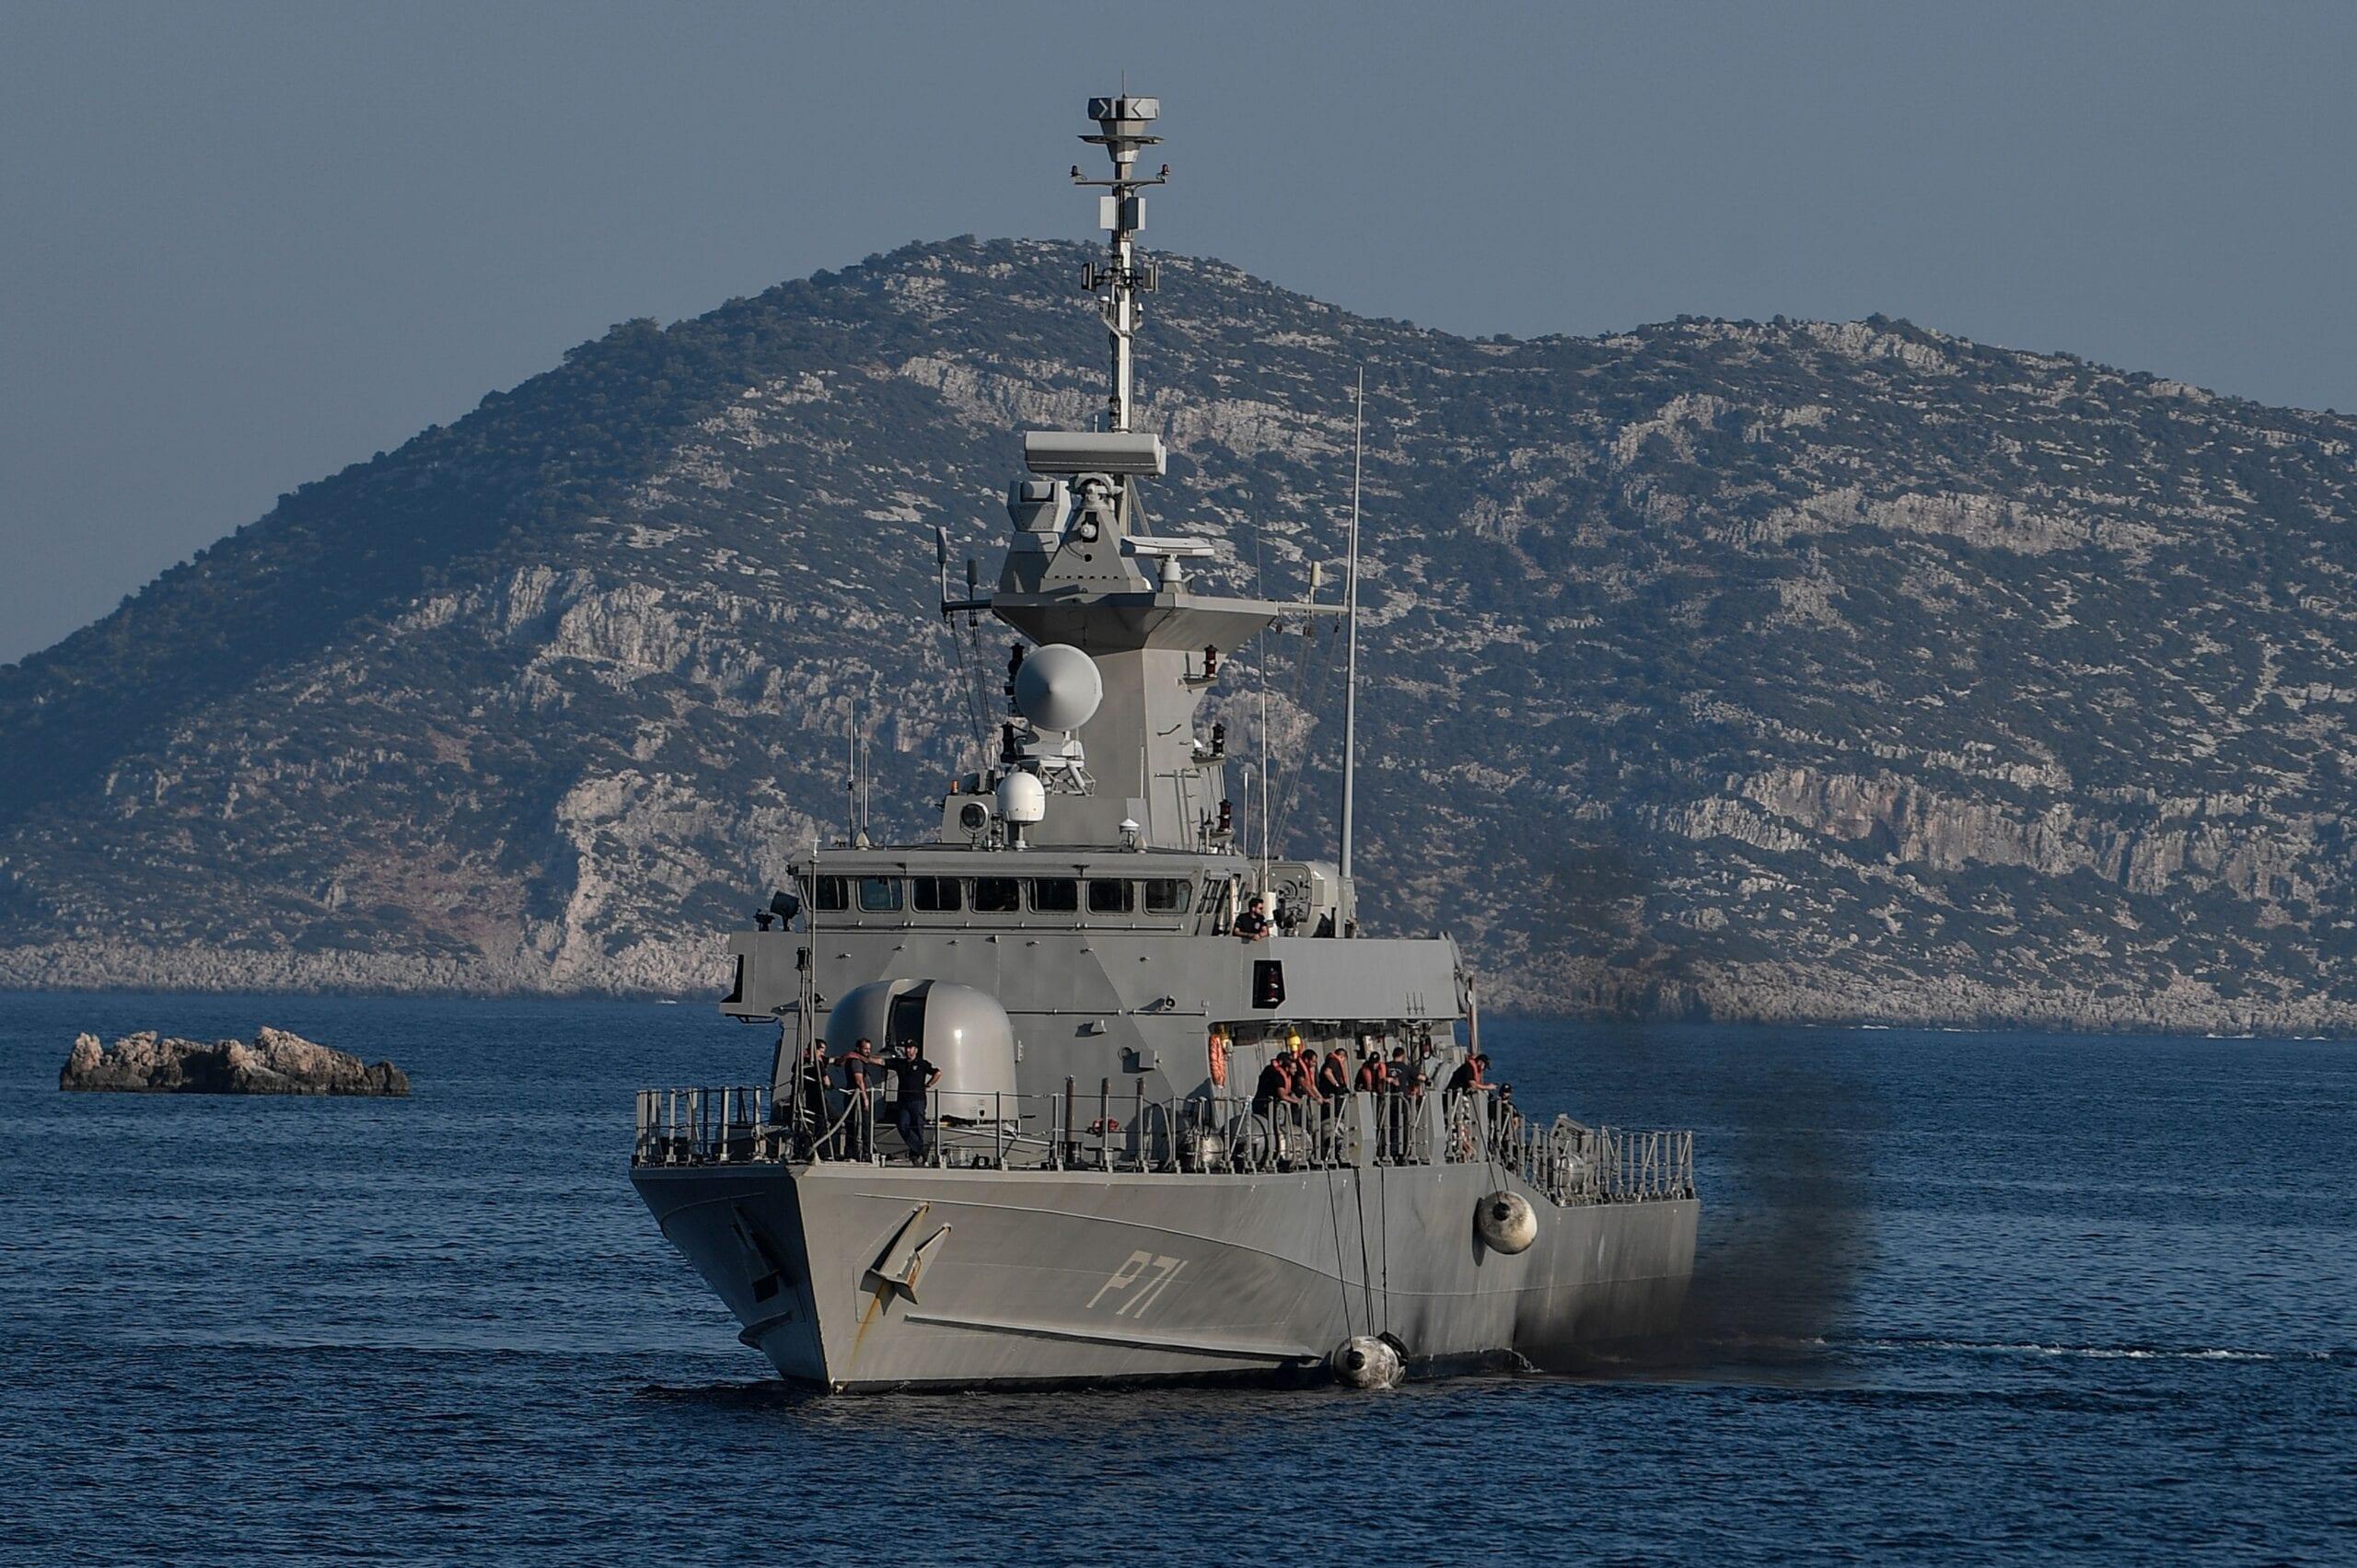 France backs Turkey sanctions as an option